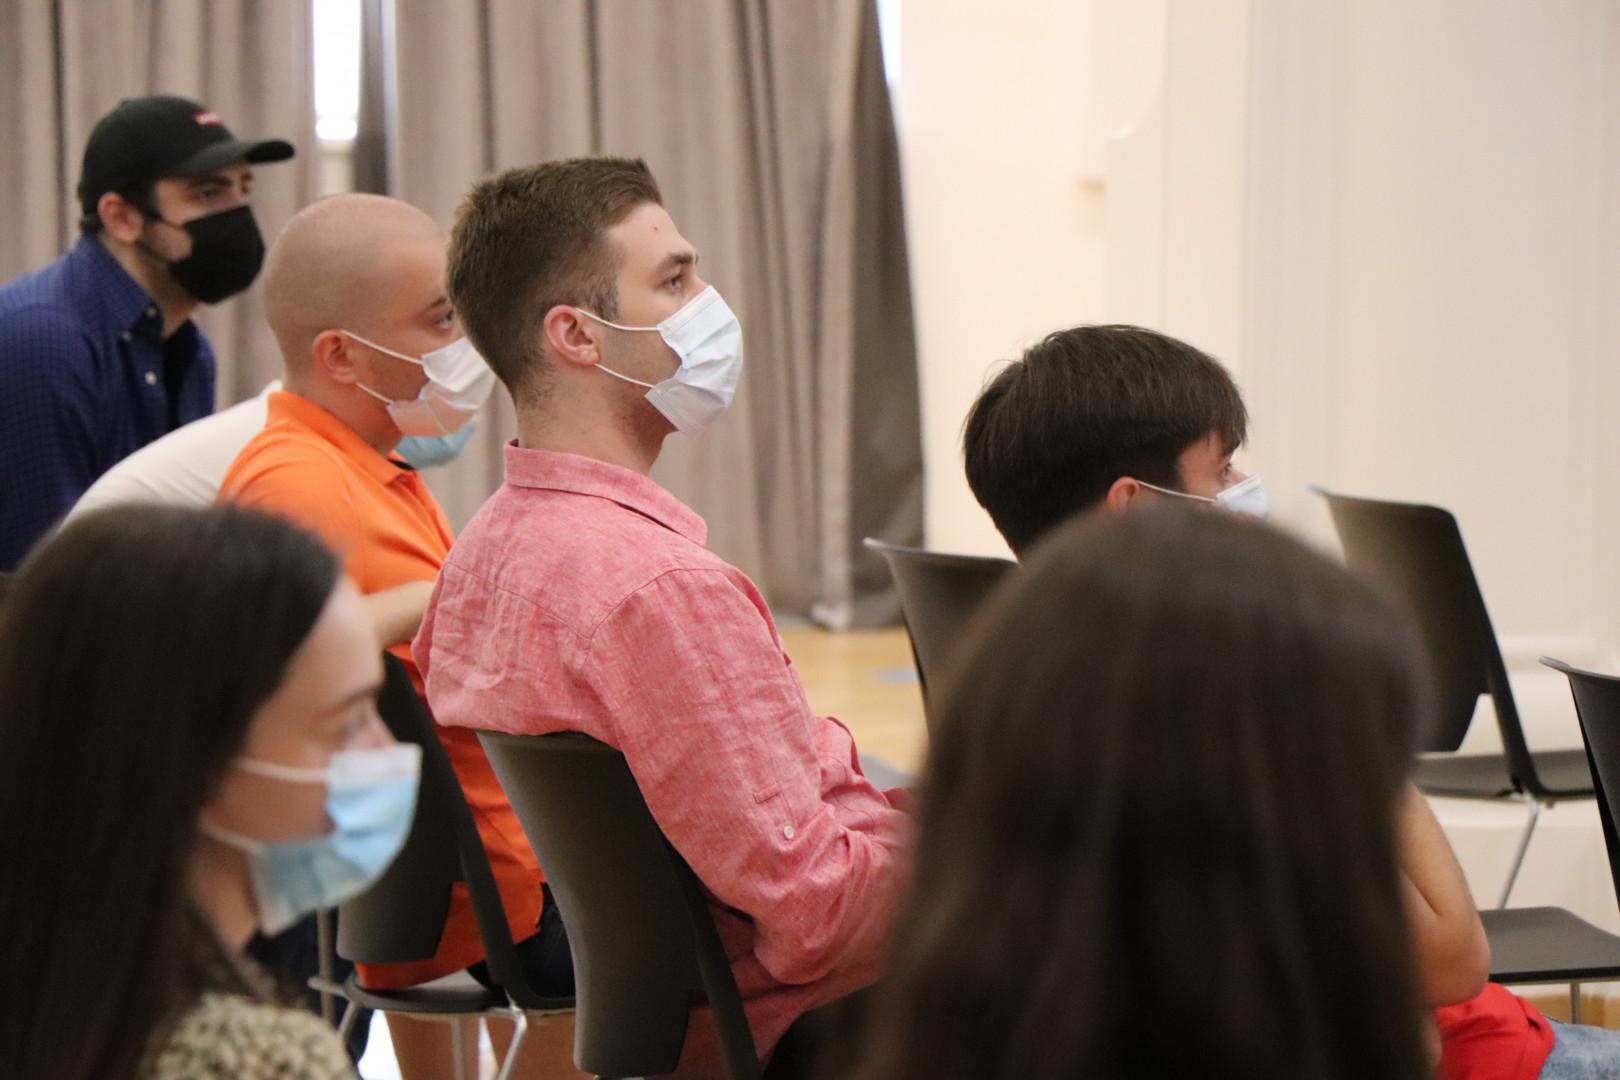 CSB-ის სკოლის ადმინისტრაციის შეხვედრა მესამე კურსის სტუდენტებთან